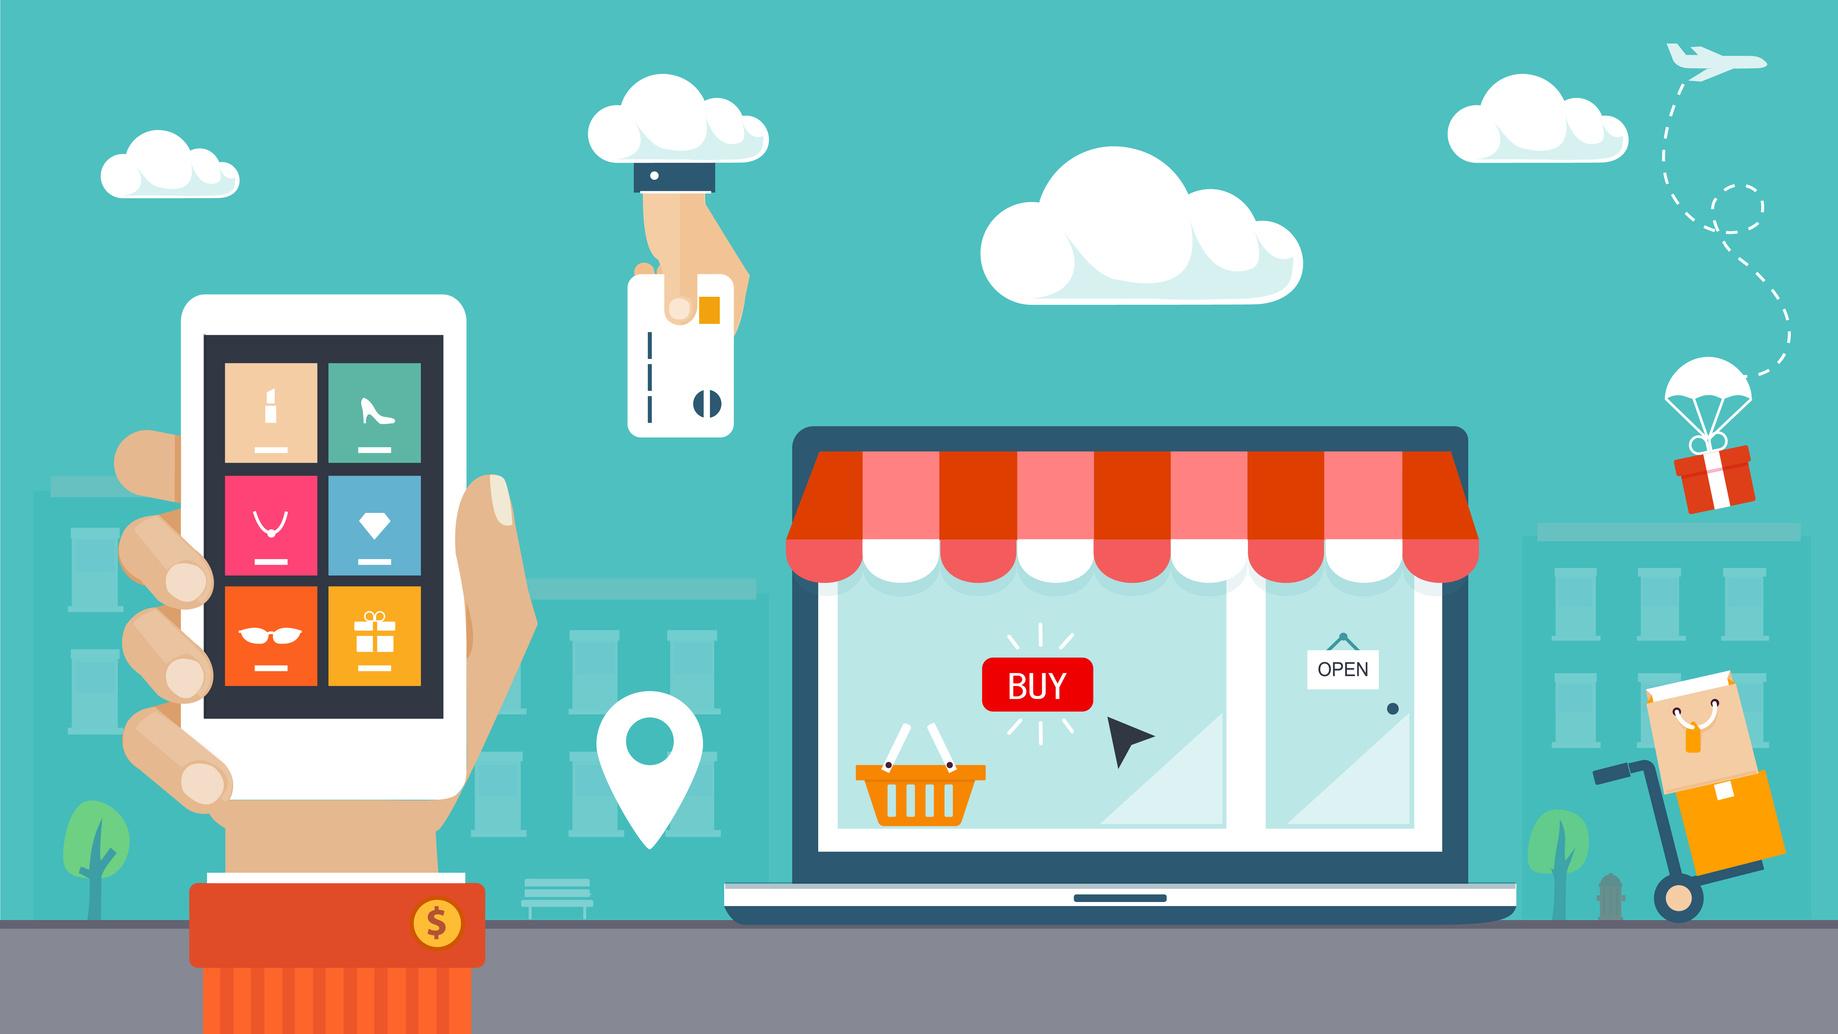 1838x1034 Flat Design Vector Illustration. E Commerce, Shopping Amp Delivery